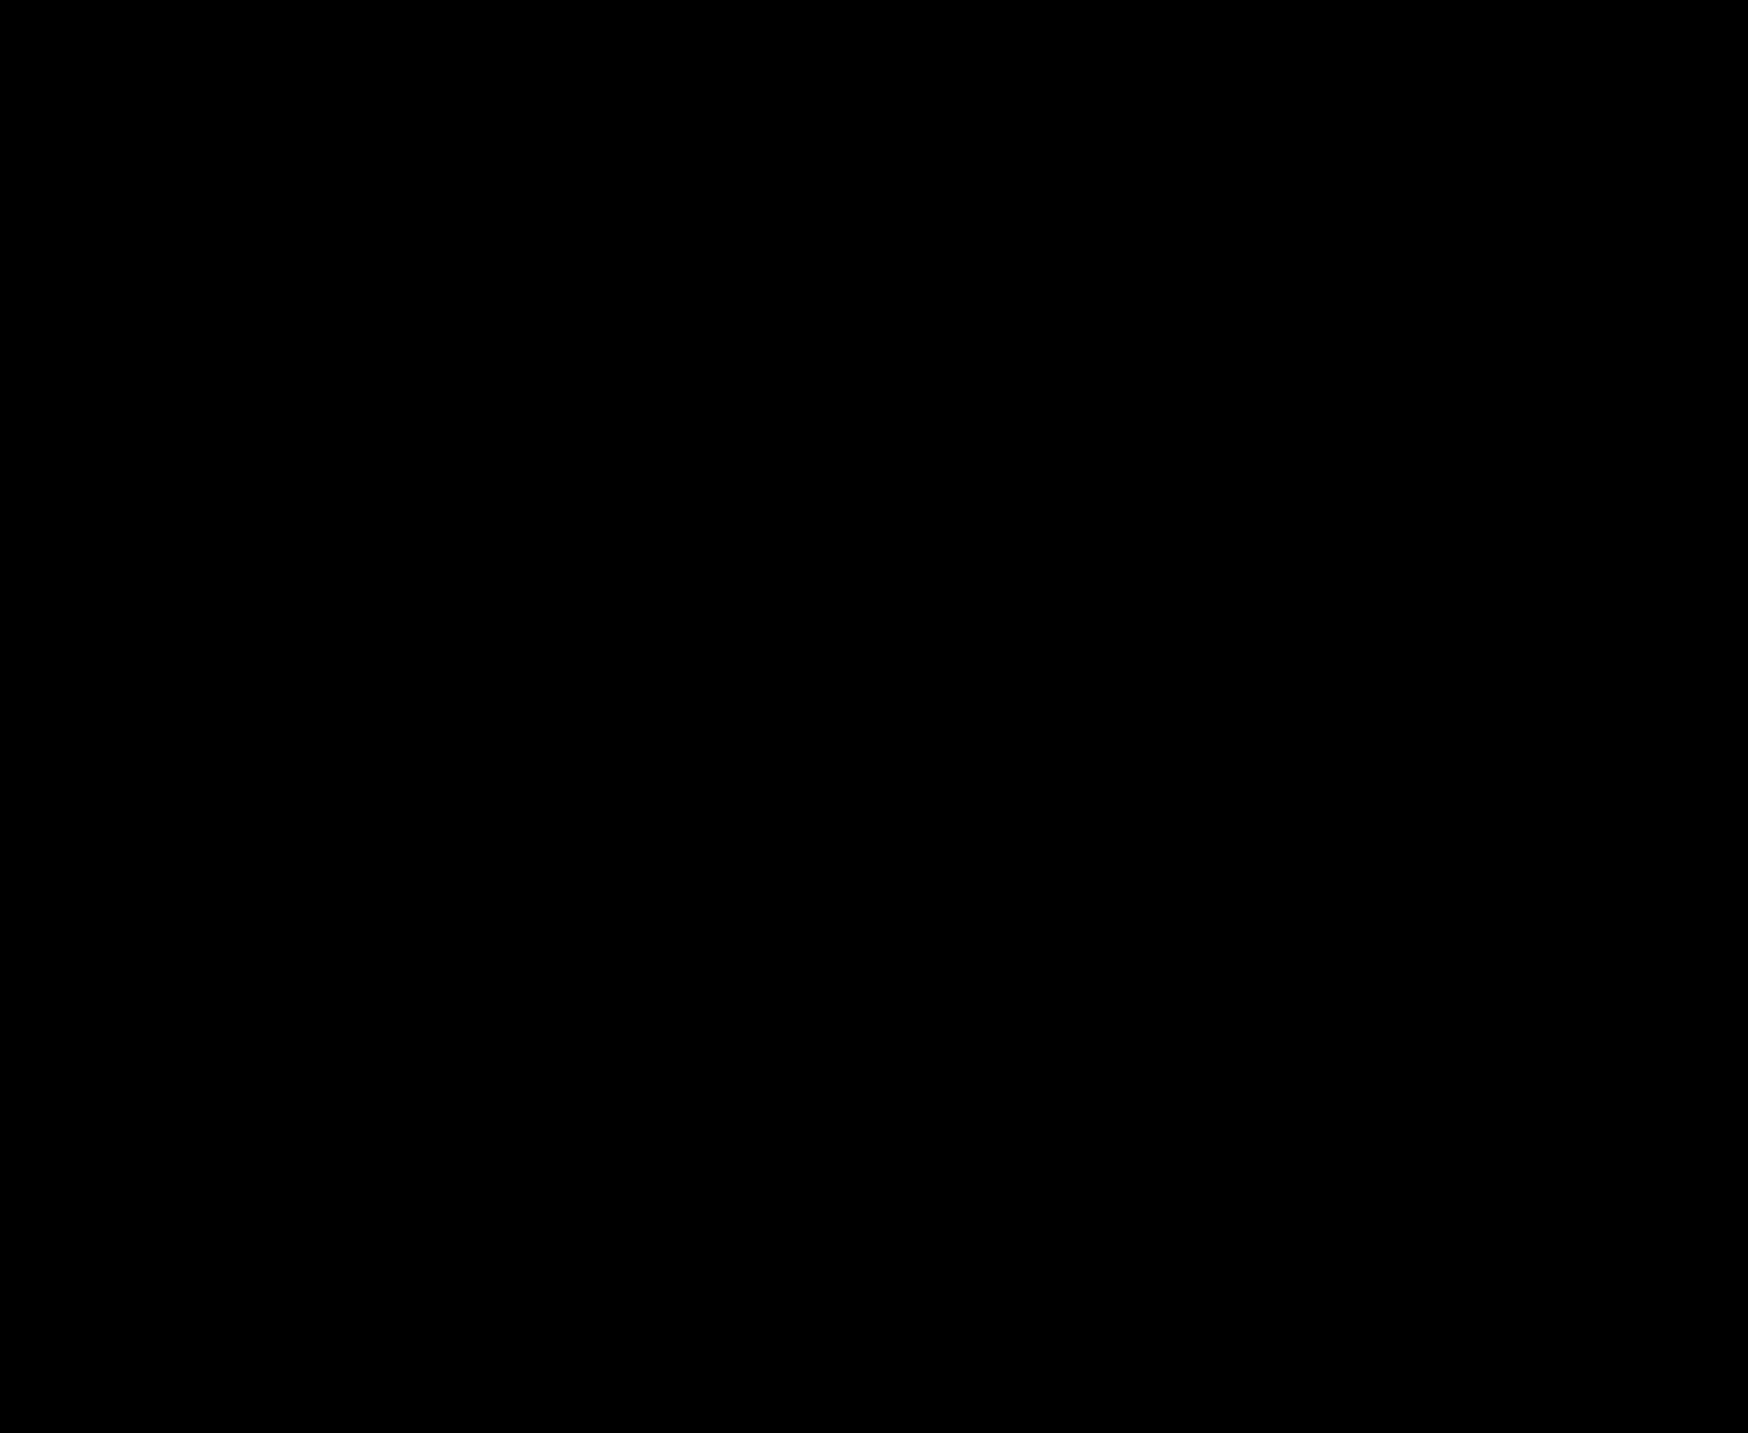 Naklejka na ścianę sokół ptak 2